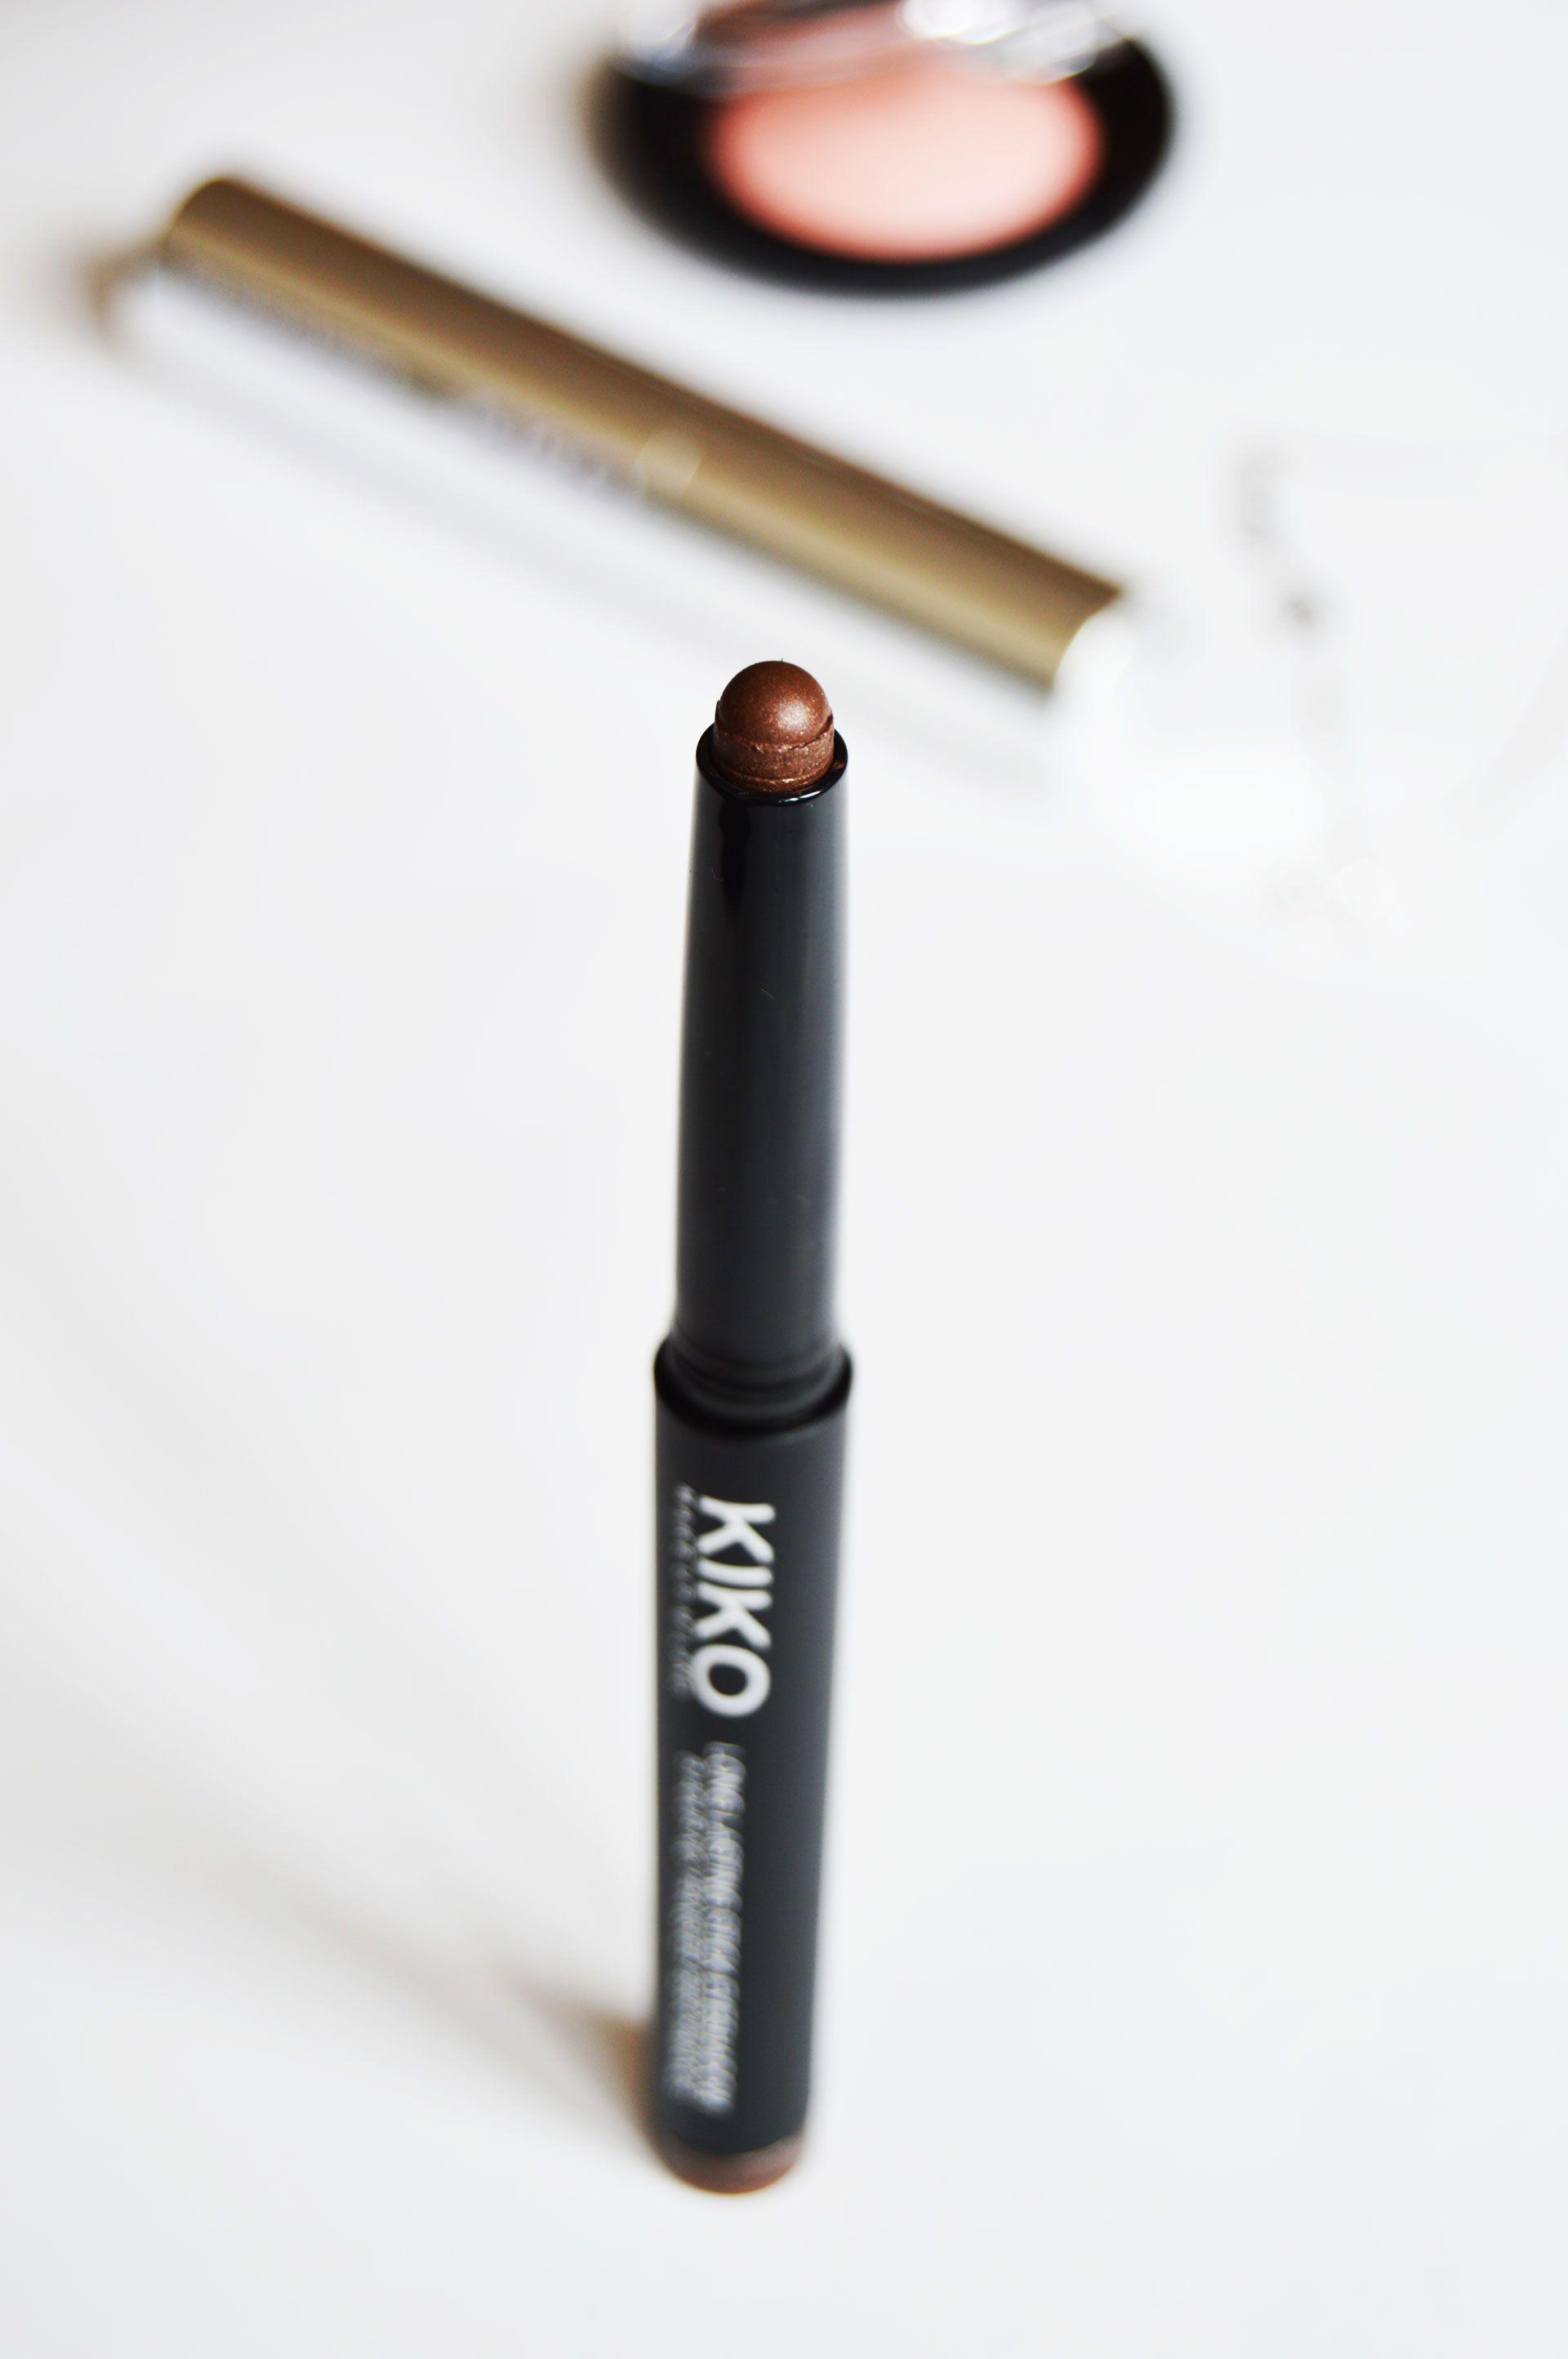 Kiko Long Lasting Eyeshadow in 04 Golden Chocolate Review